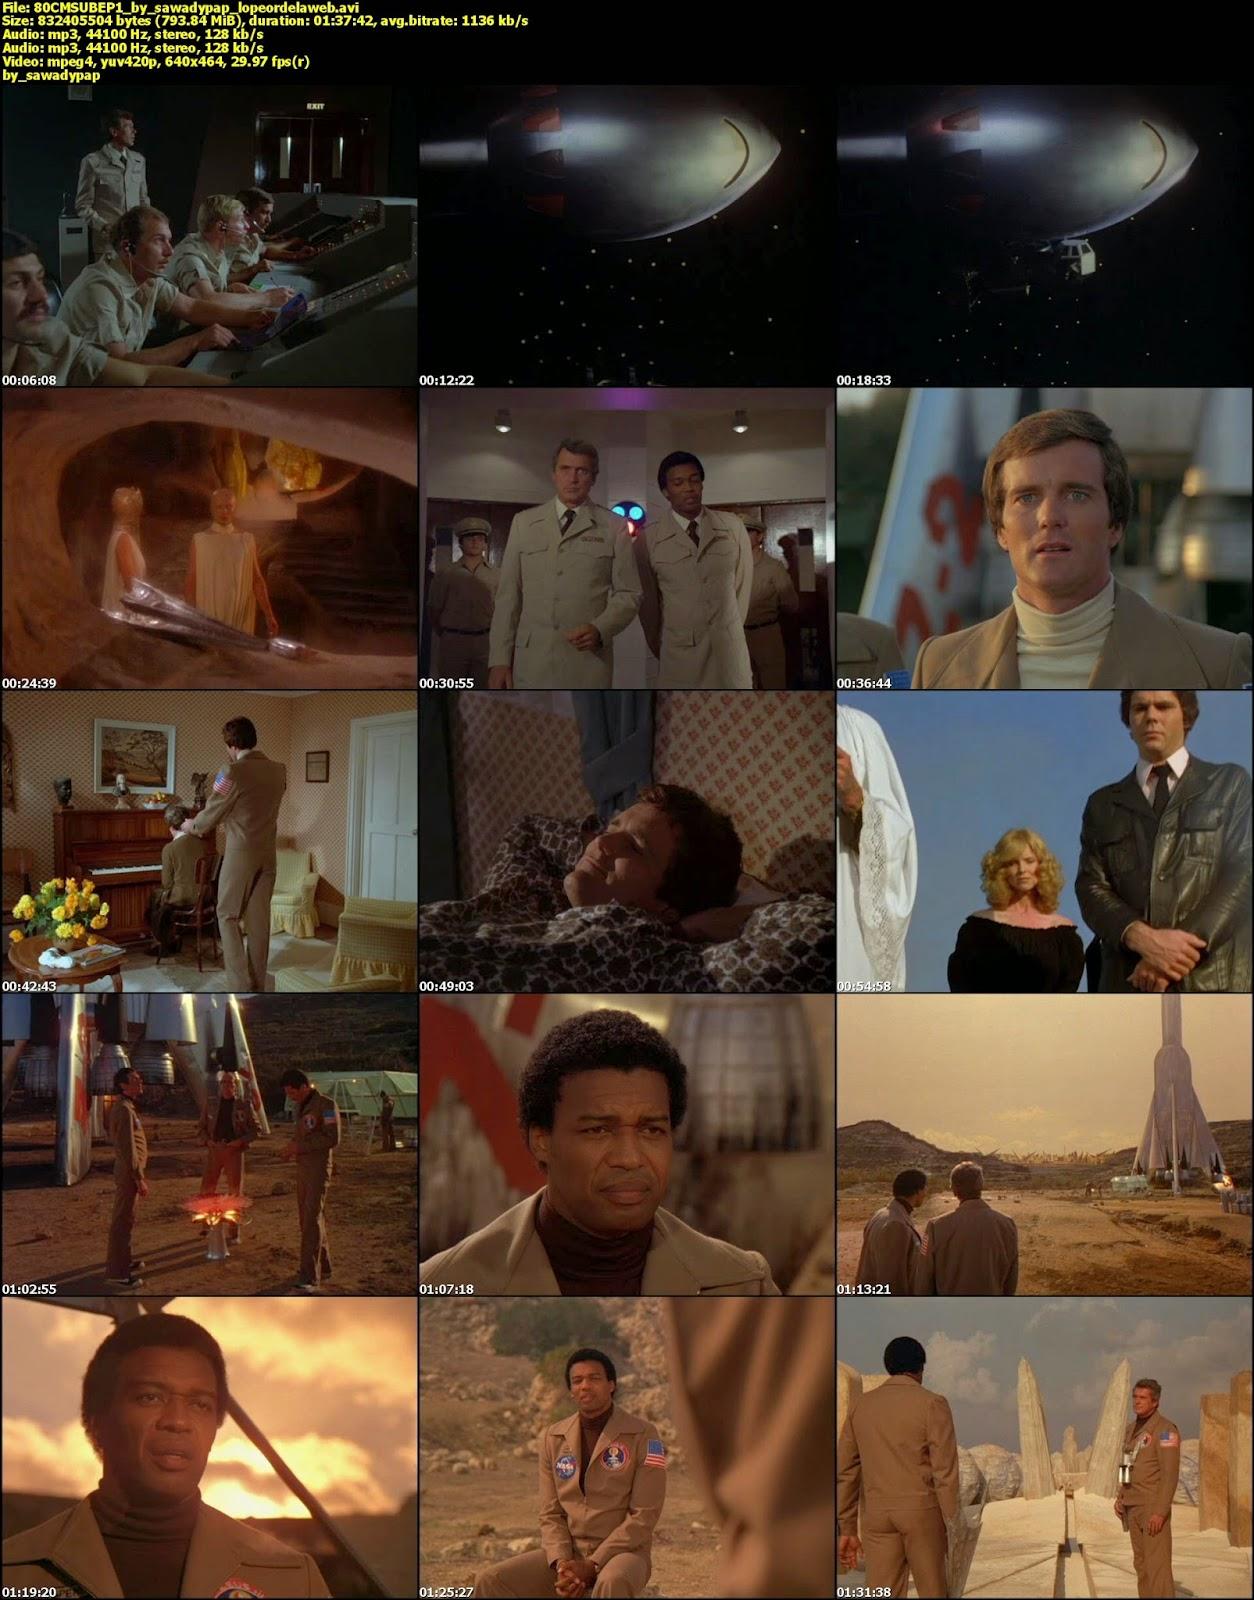 [MiniSerie] Crónicas Marcianas [1980] [DVDRip] [Dual Audio]